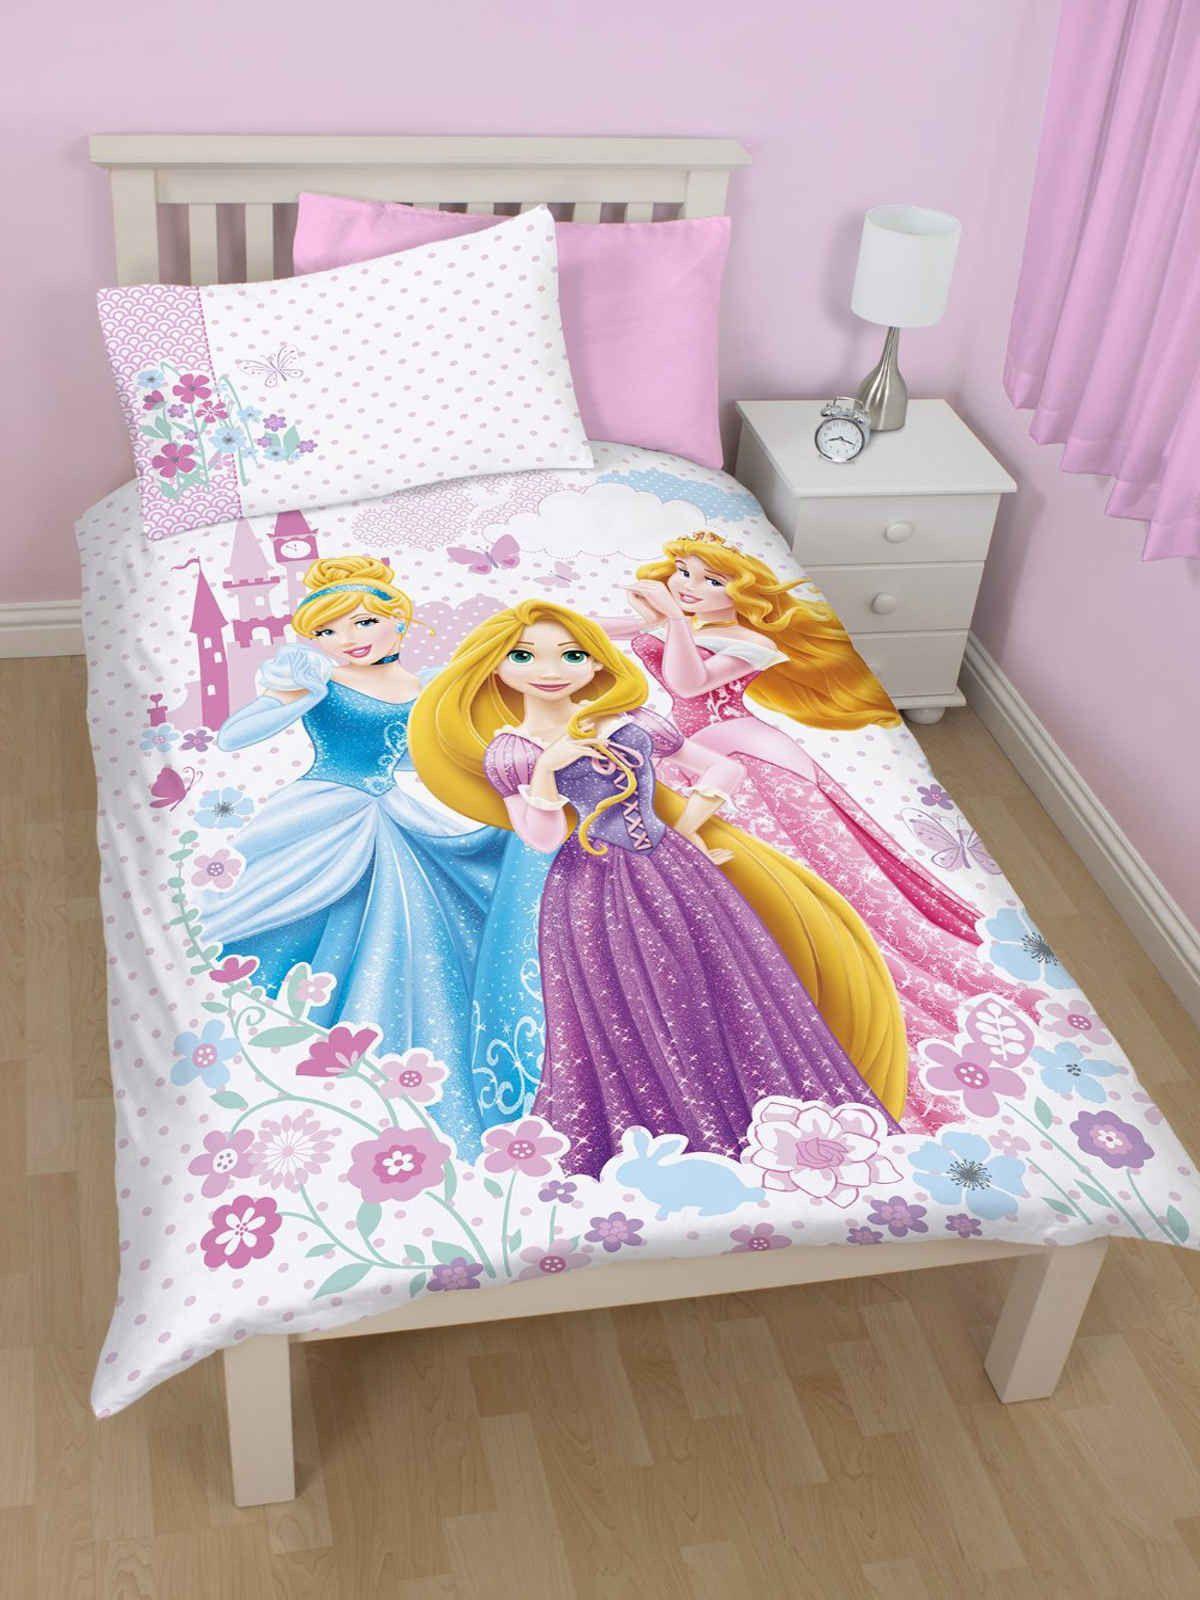 Disney Princess Magic Single Duvet Cover and Pillowcase Set Texco Direct